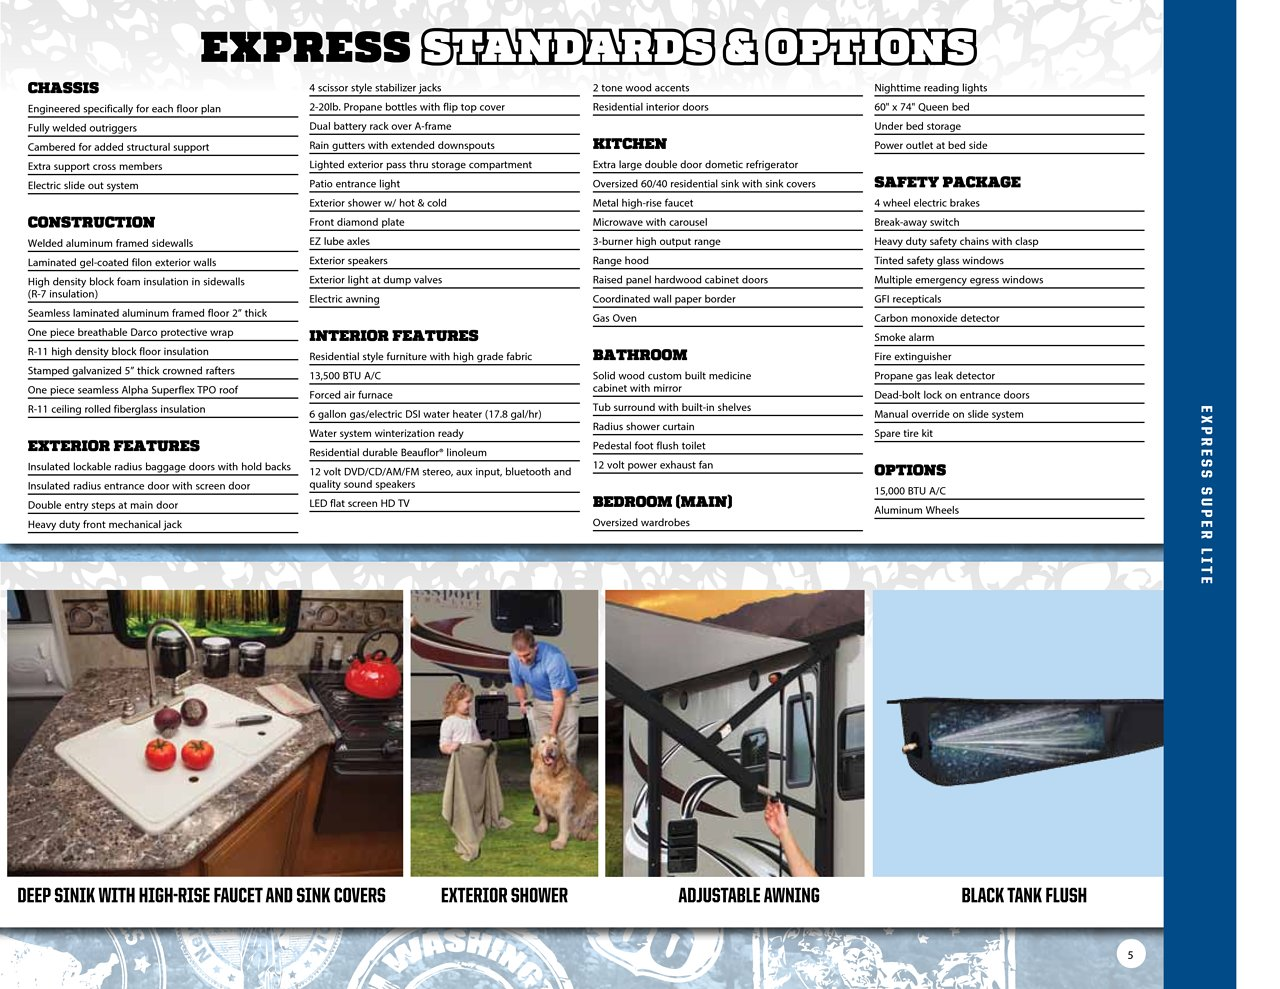 2015 Keystone Rv Passport Brochure | Download RV brochures